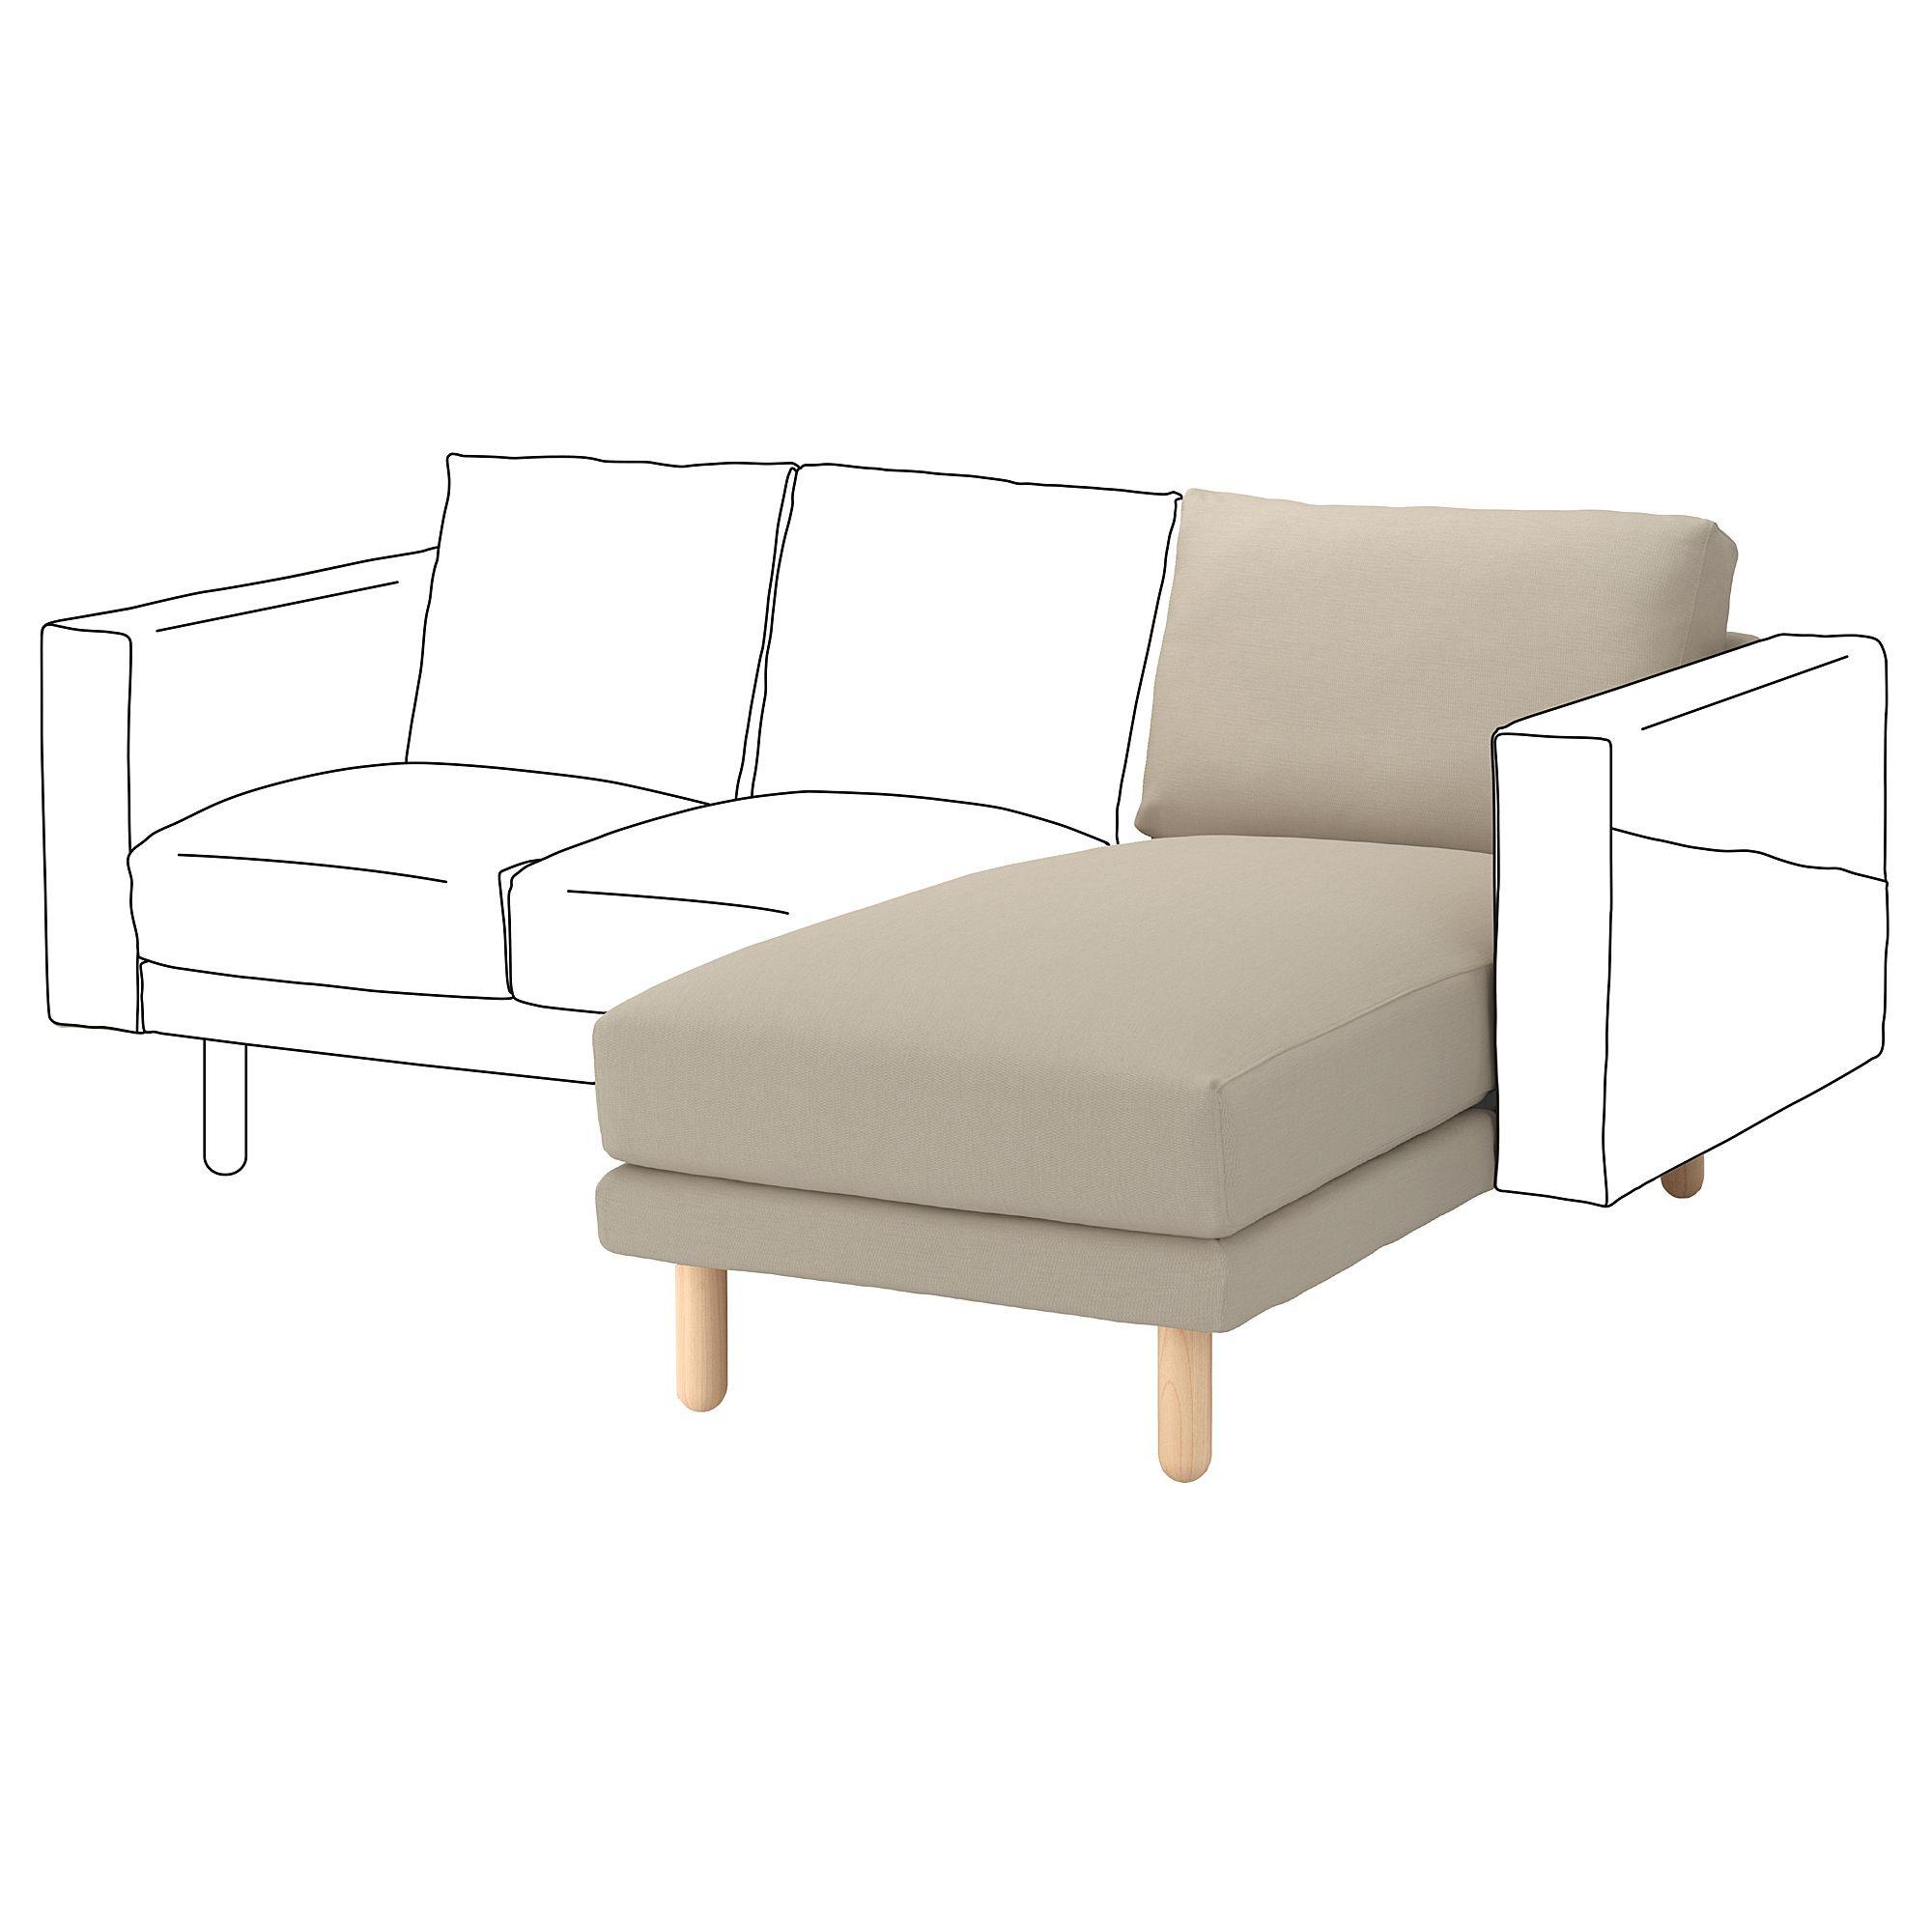 Furniture And Home Furnishings Norsborg Chaise Longue Ikea